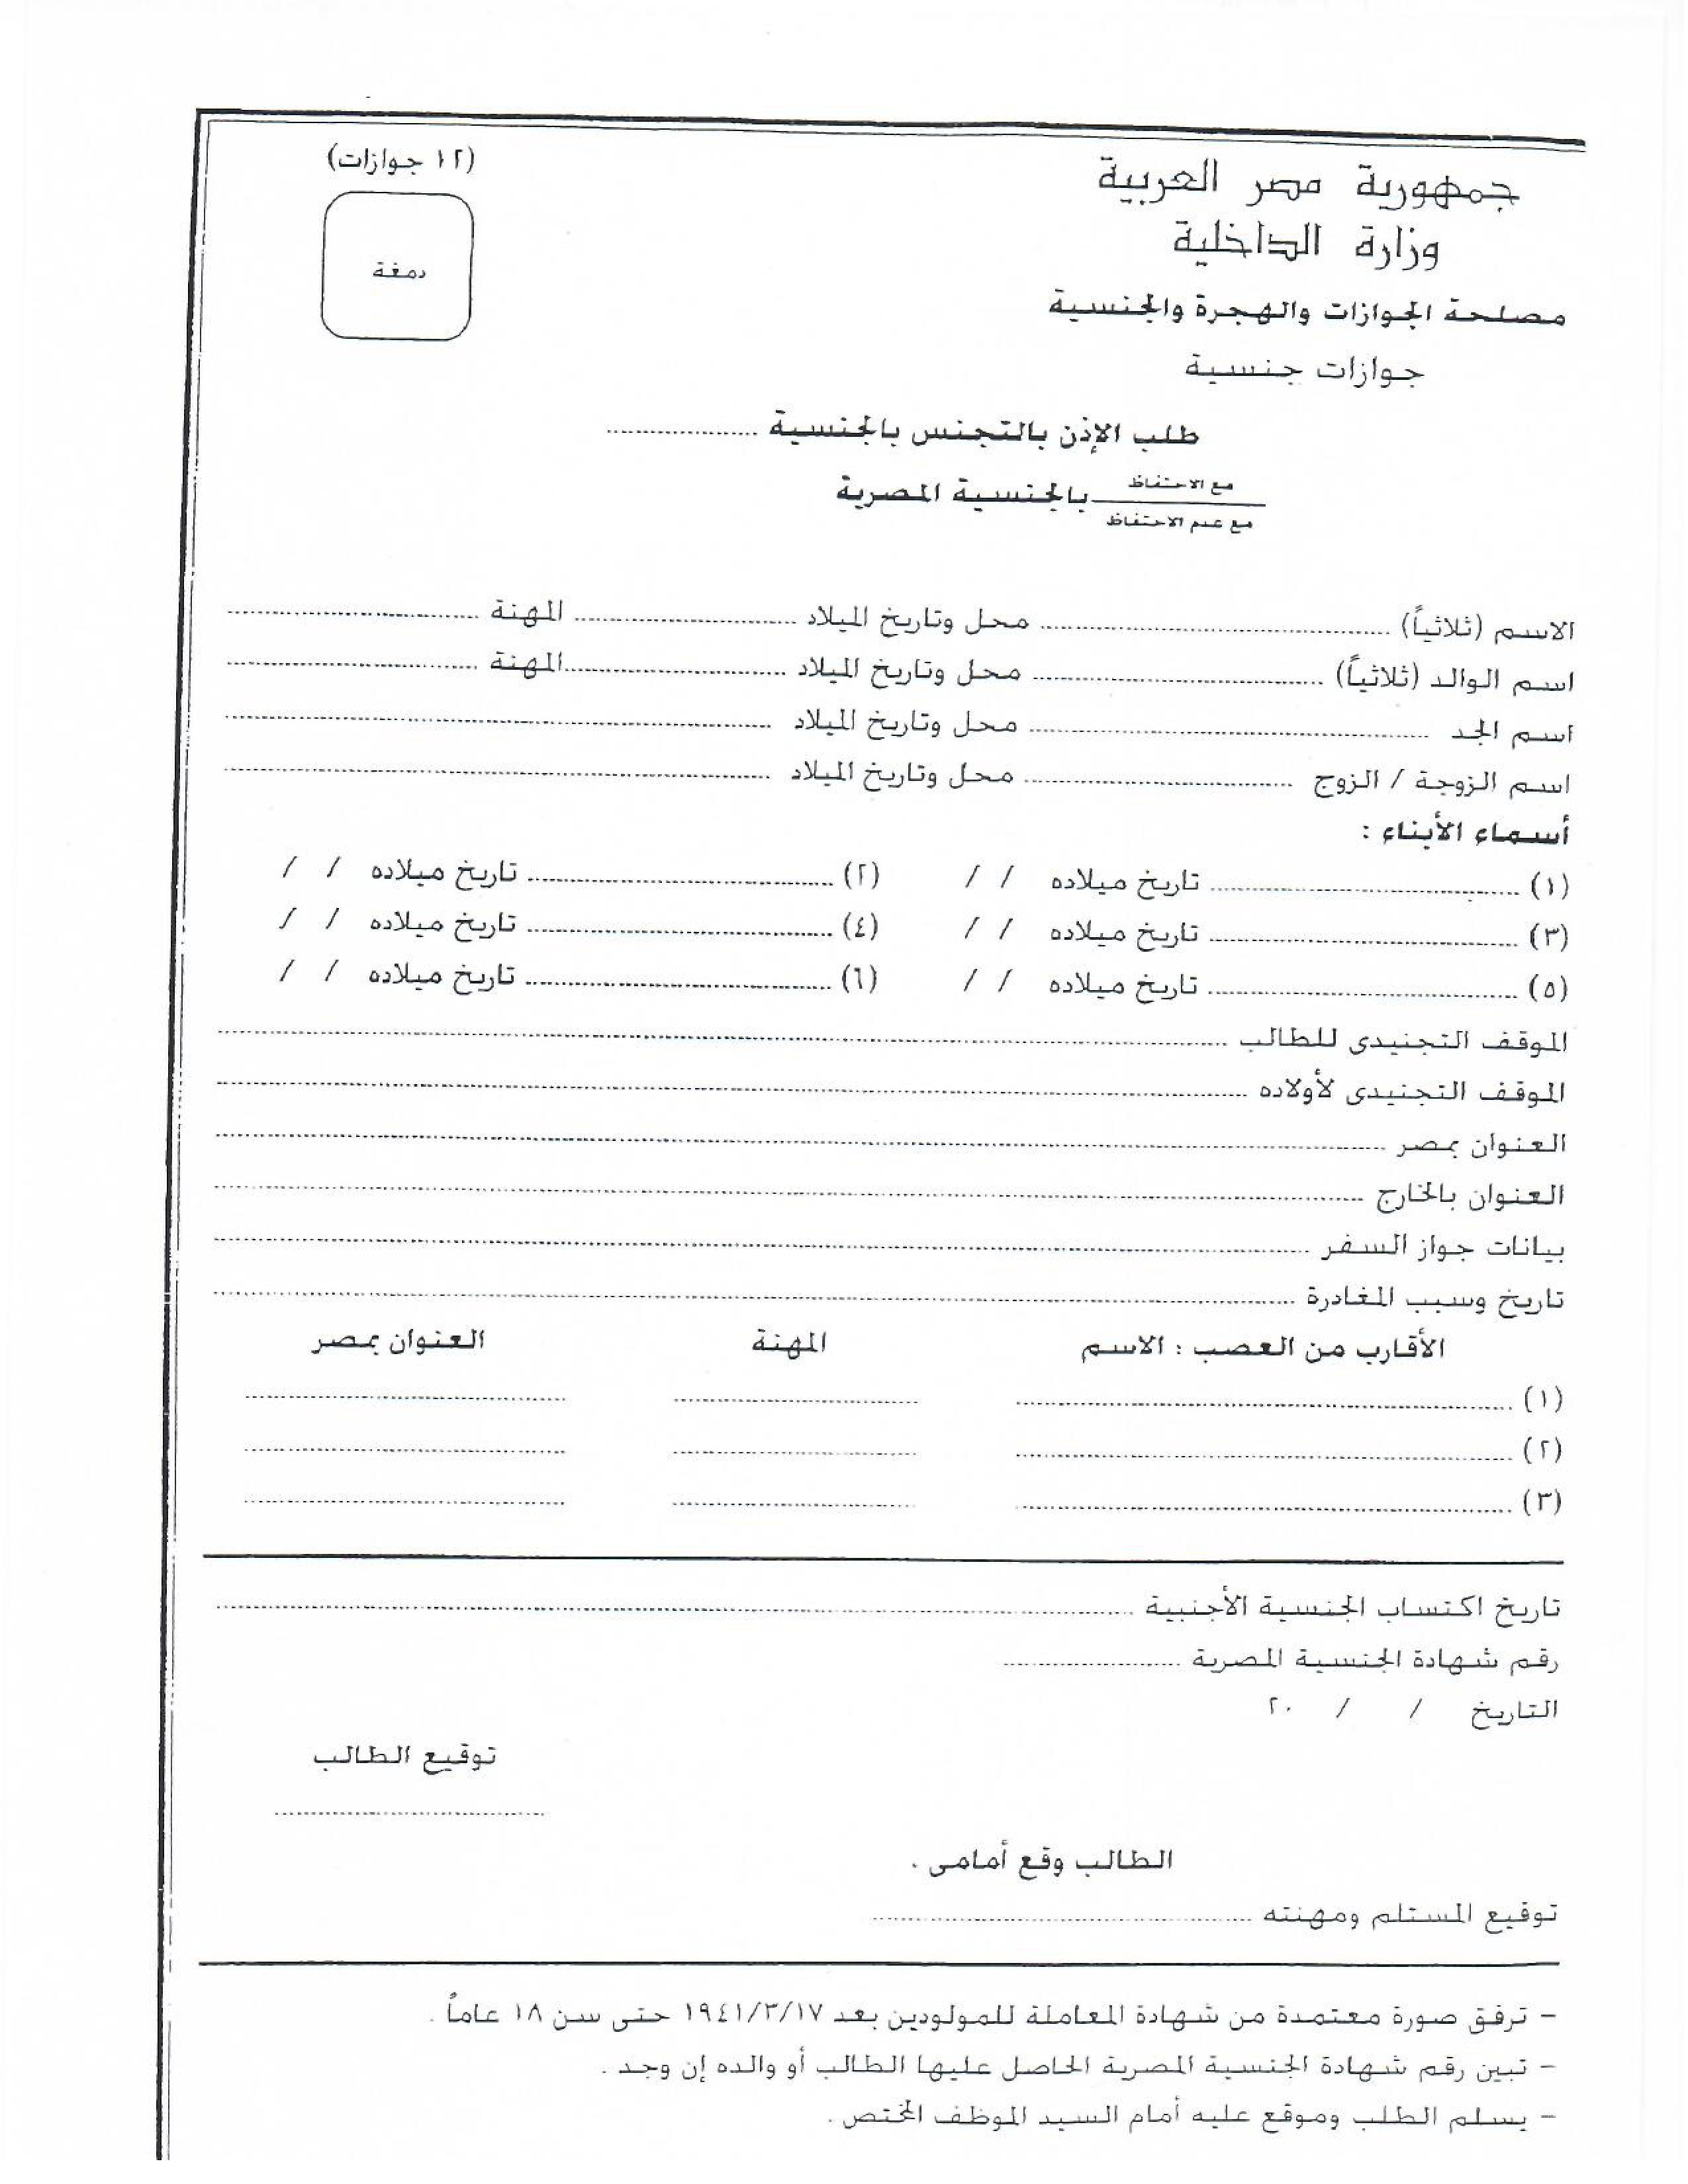 Botschaft Der Arabischen Republik Agypten In Berlin معلومات للمواطنين المصريين